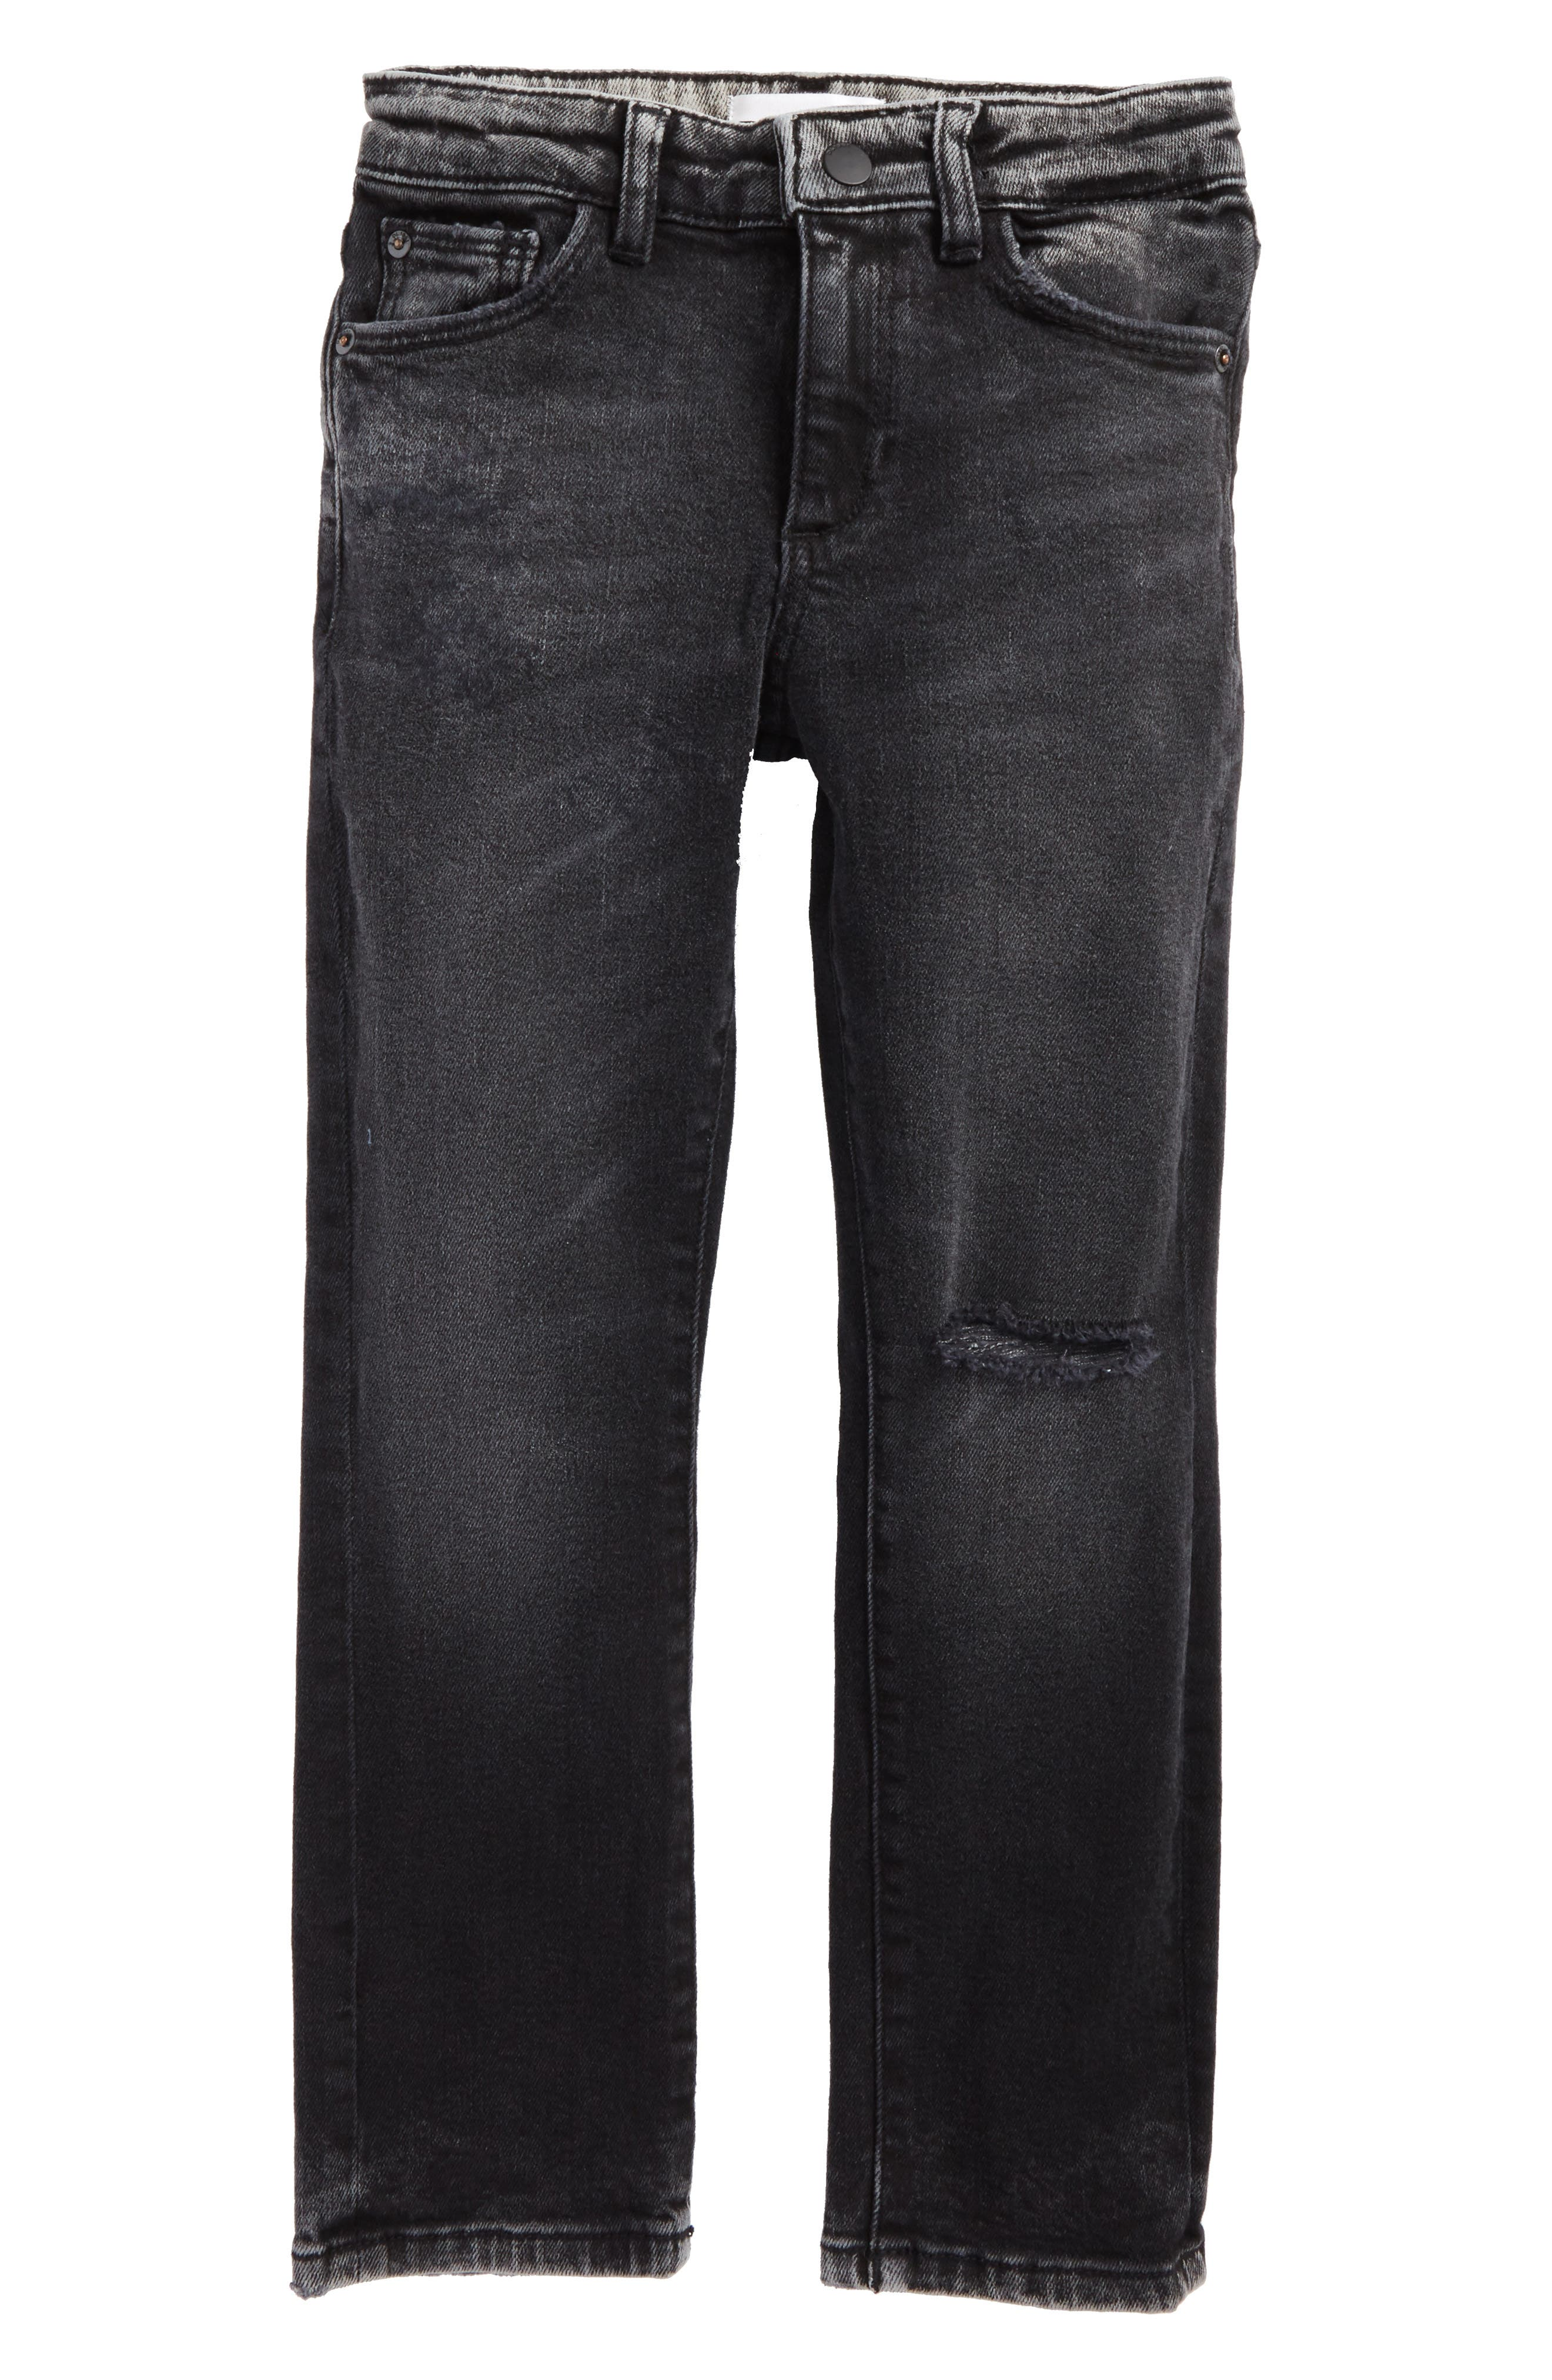 Hawke Skinny Jeans,                         Main,                         color,